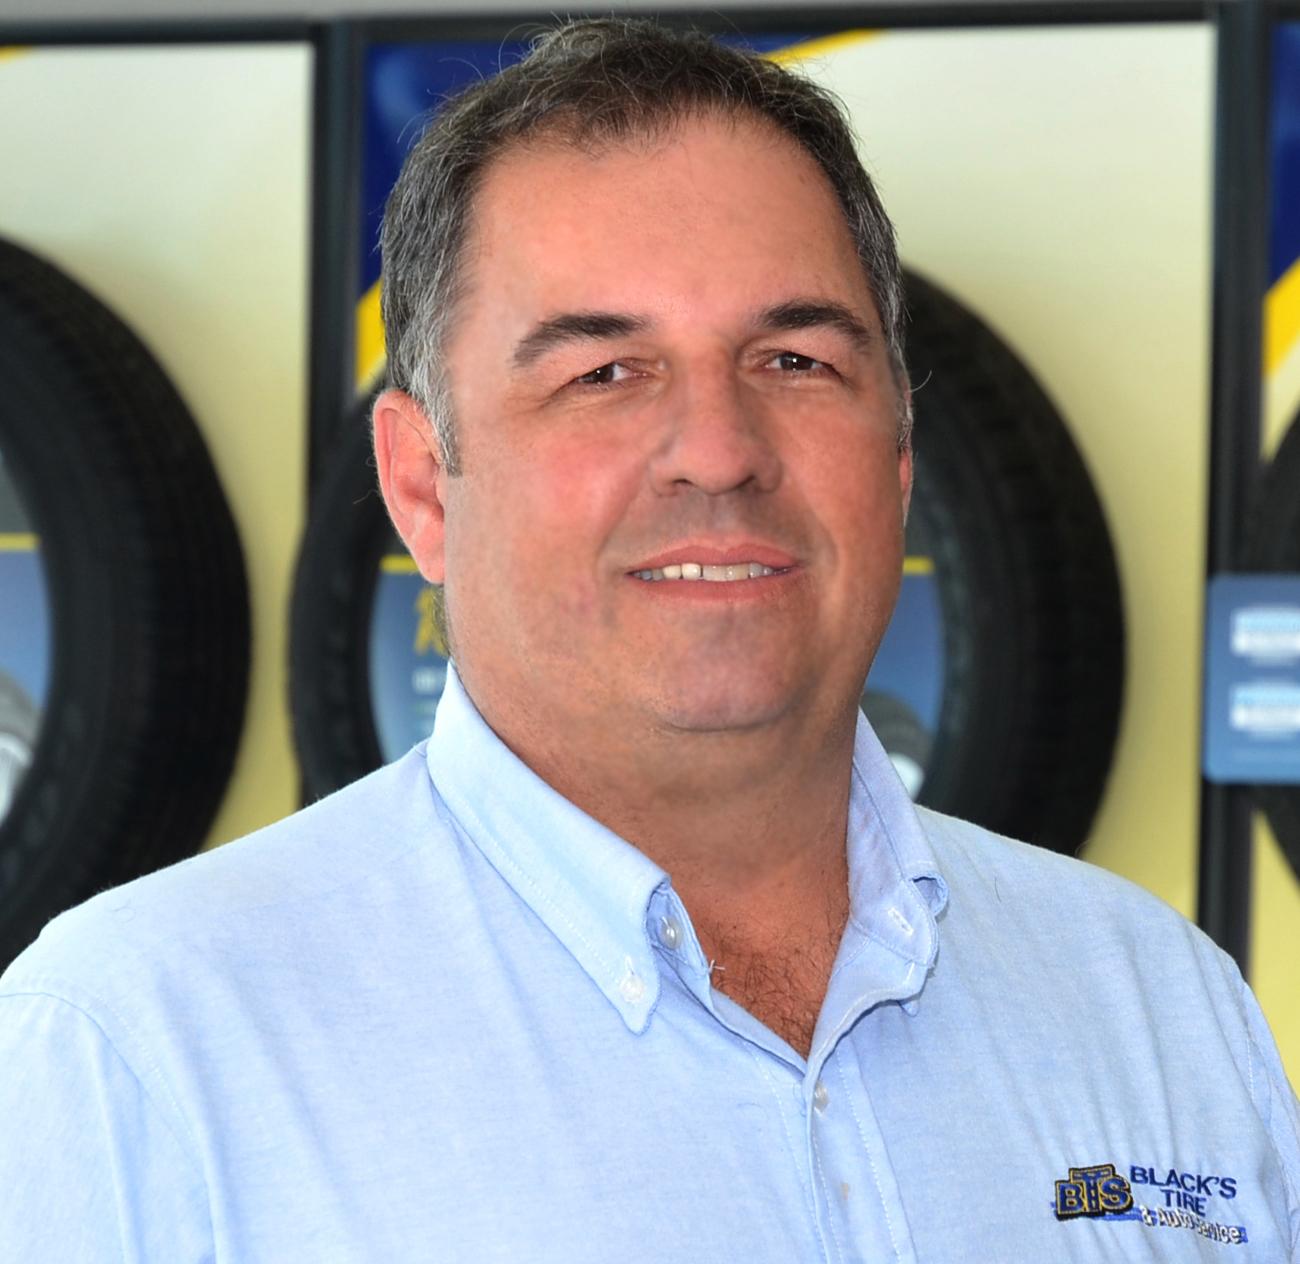 Cottman Transmission And Total Auto Care Of Gladstone: Black's Tire & Auto Services, Wilmington North Carolina